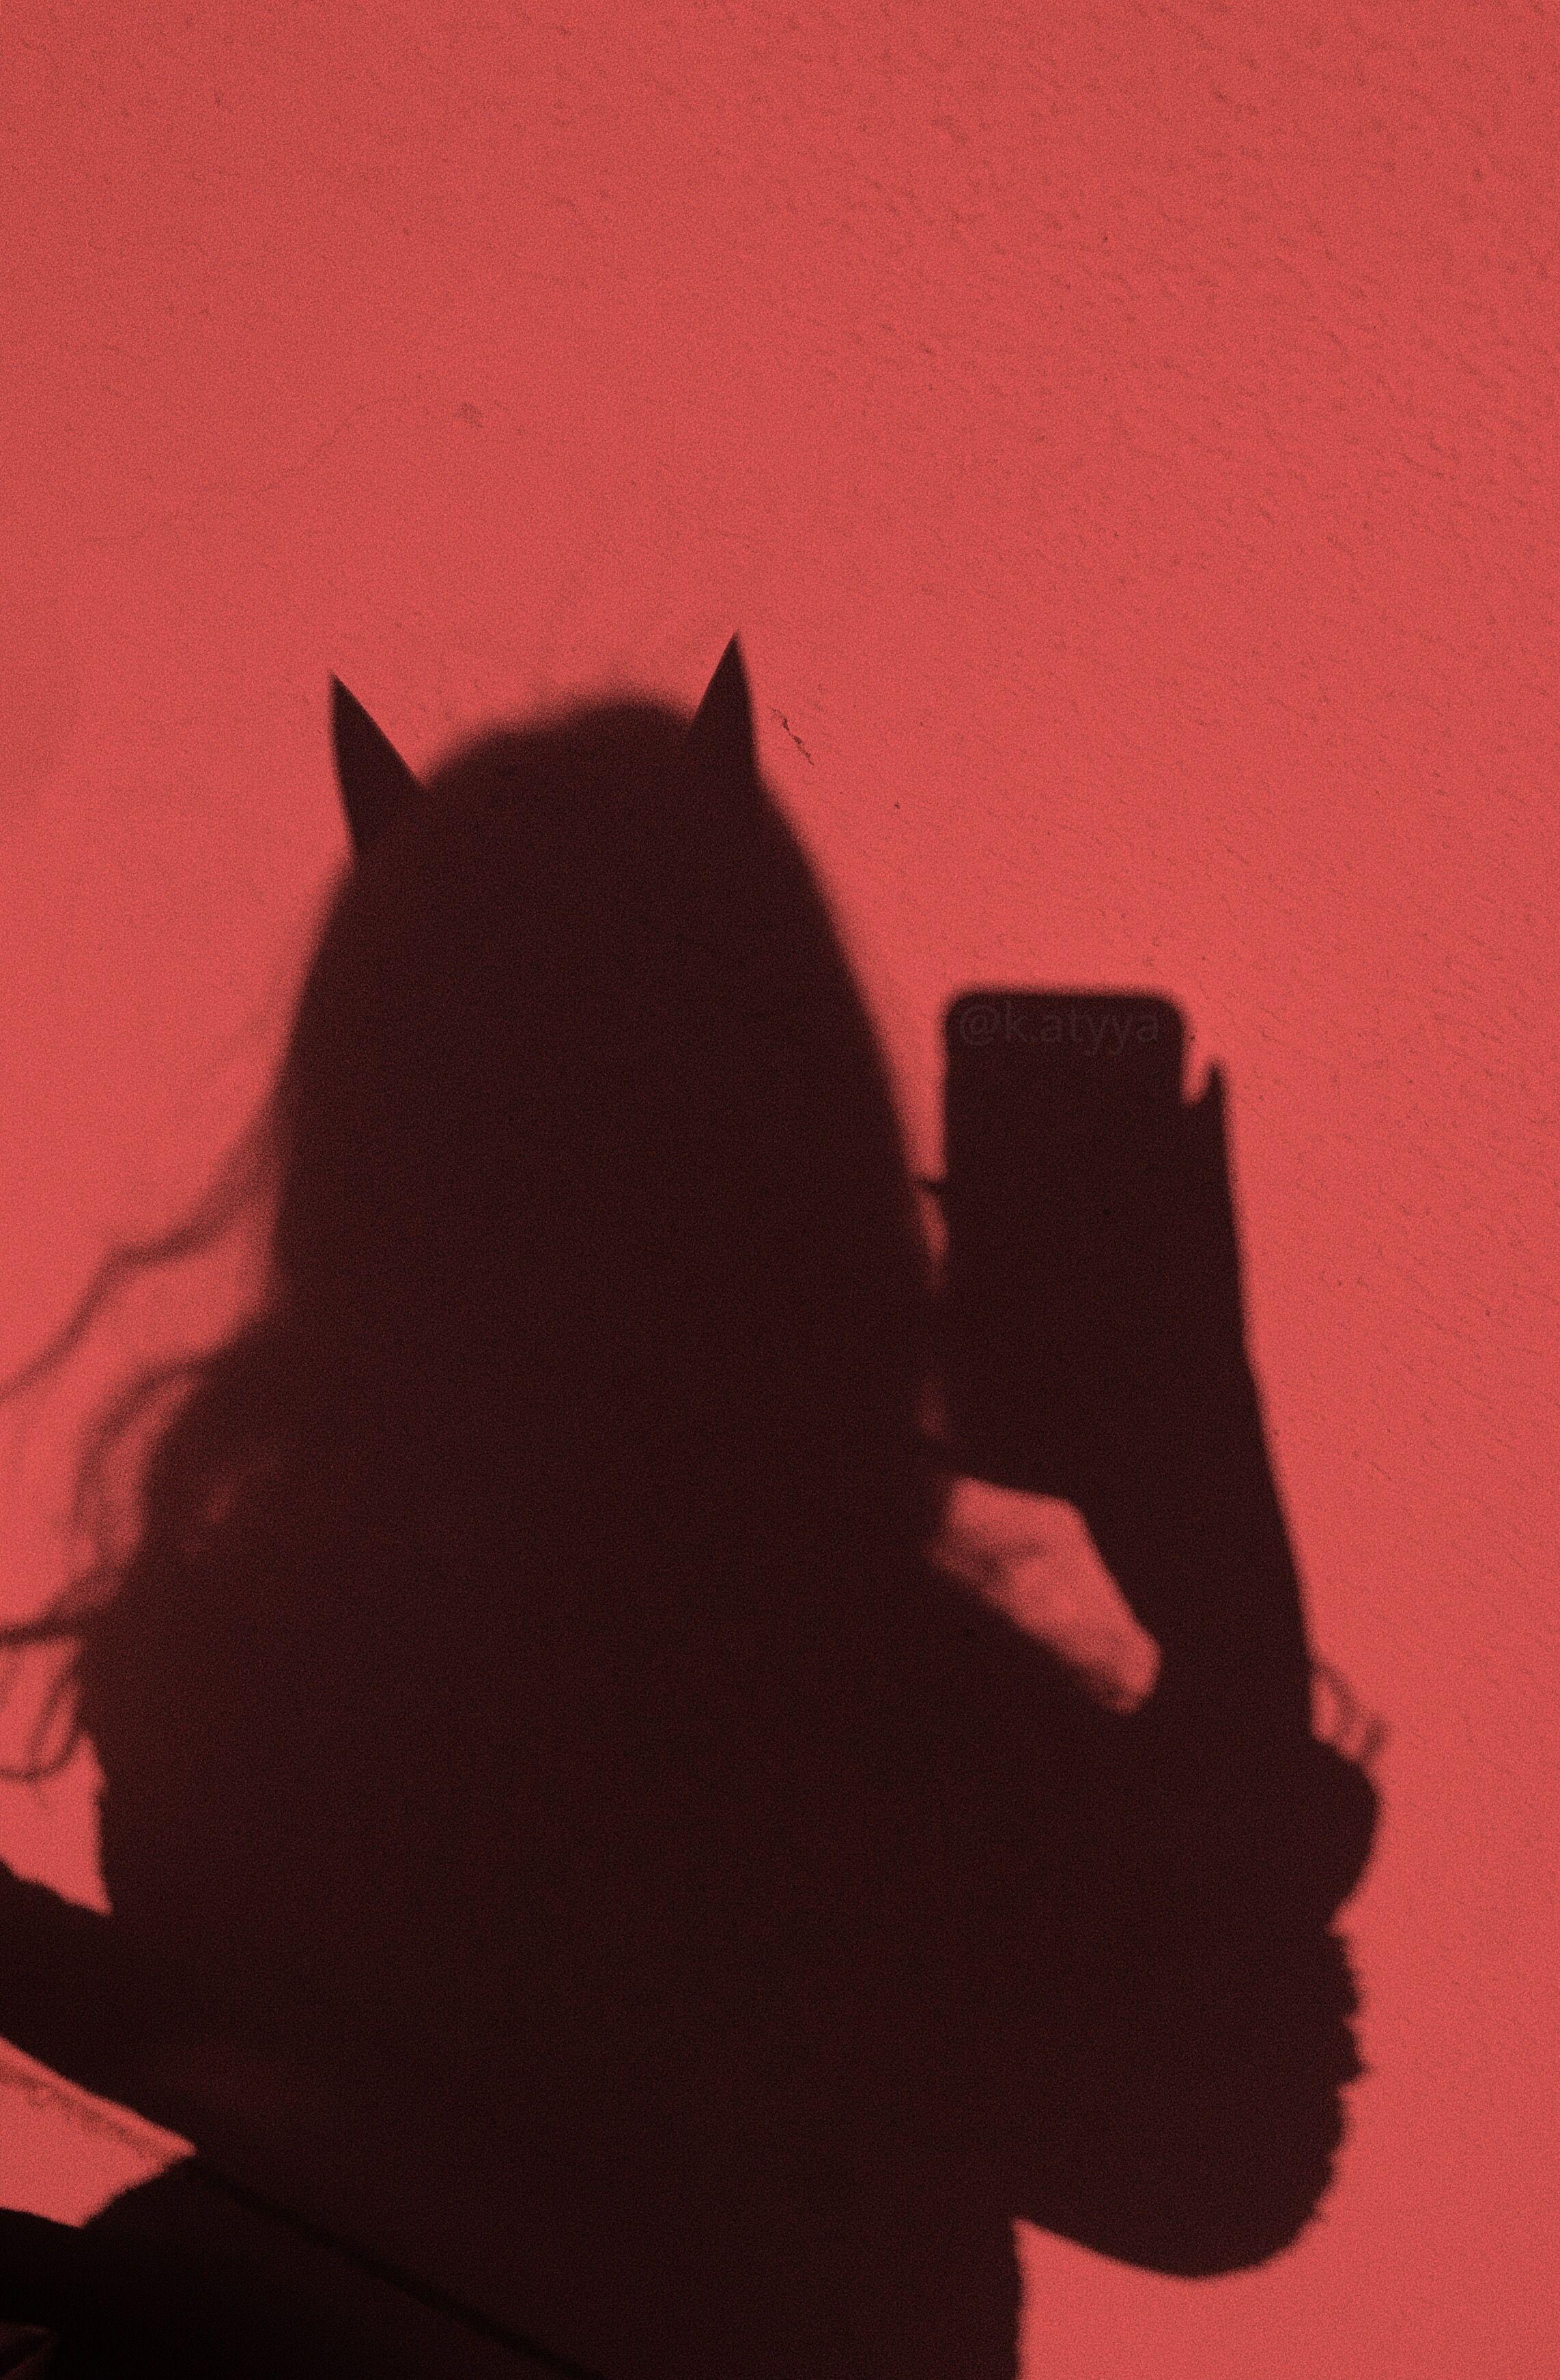 Search Results Aesthetic Devil Boy Shadow - BestTemplatess